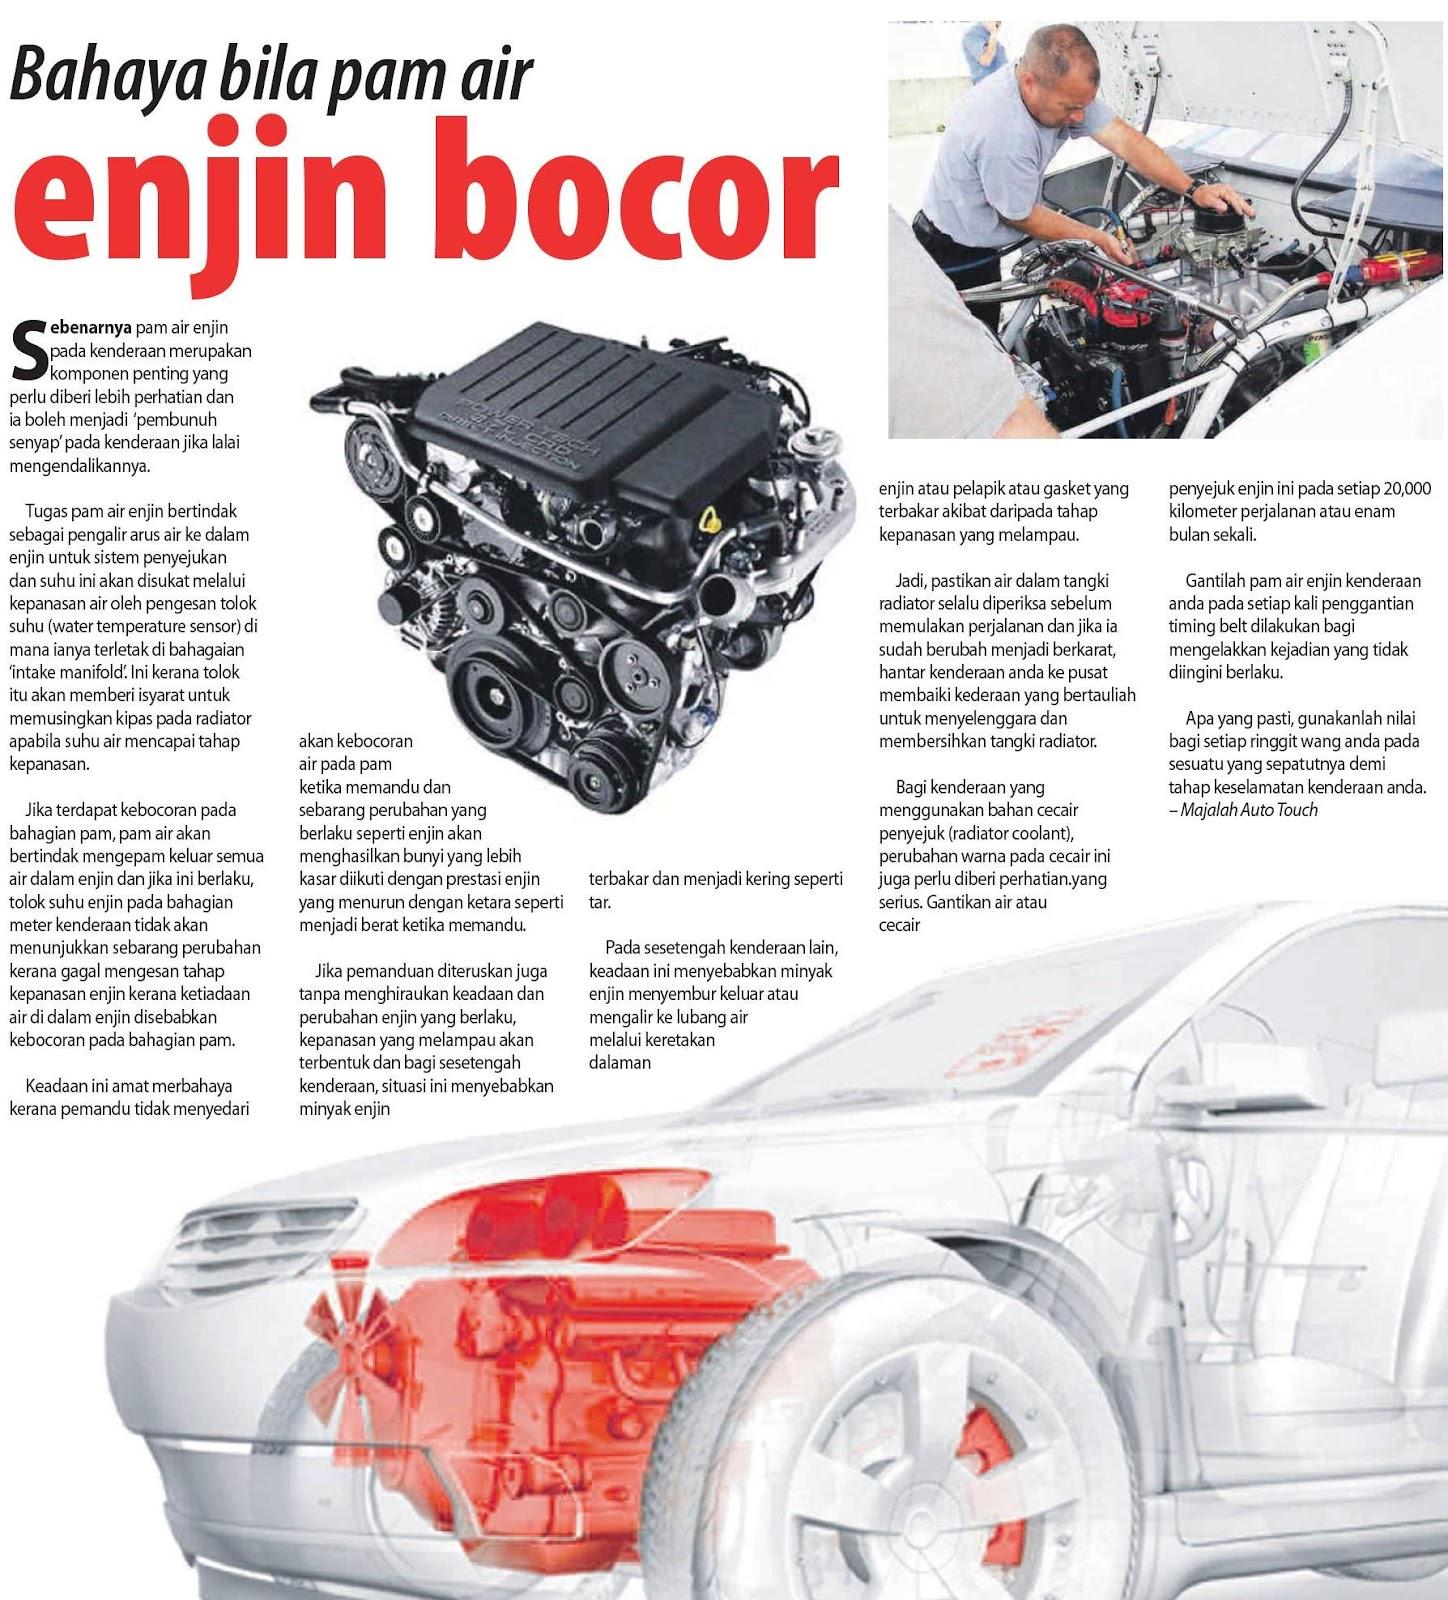 Jom belajar mekanik sekejap linkwithin pam air kenderaan bertindak sebagai pengalir arus air ke dalam enjin untuk sistem penyejukan dan suhu ini akan